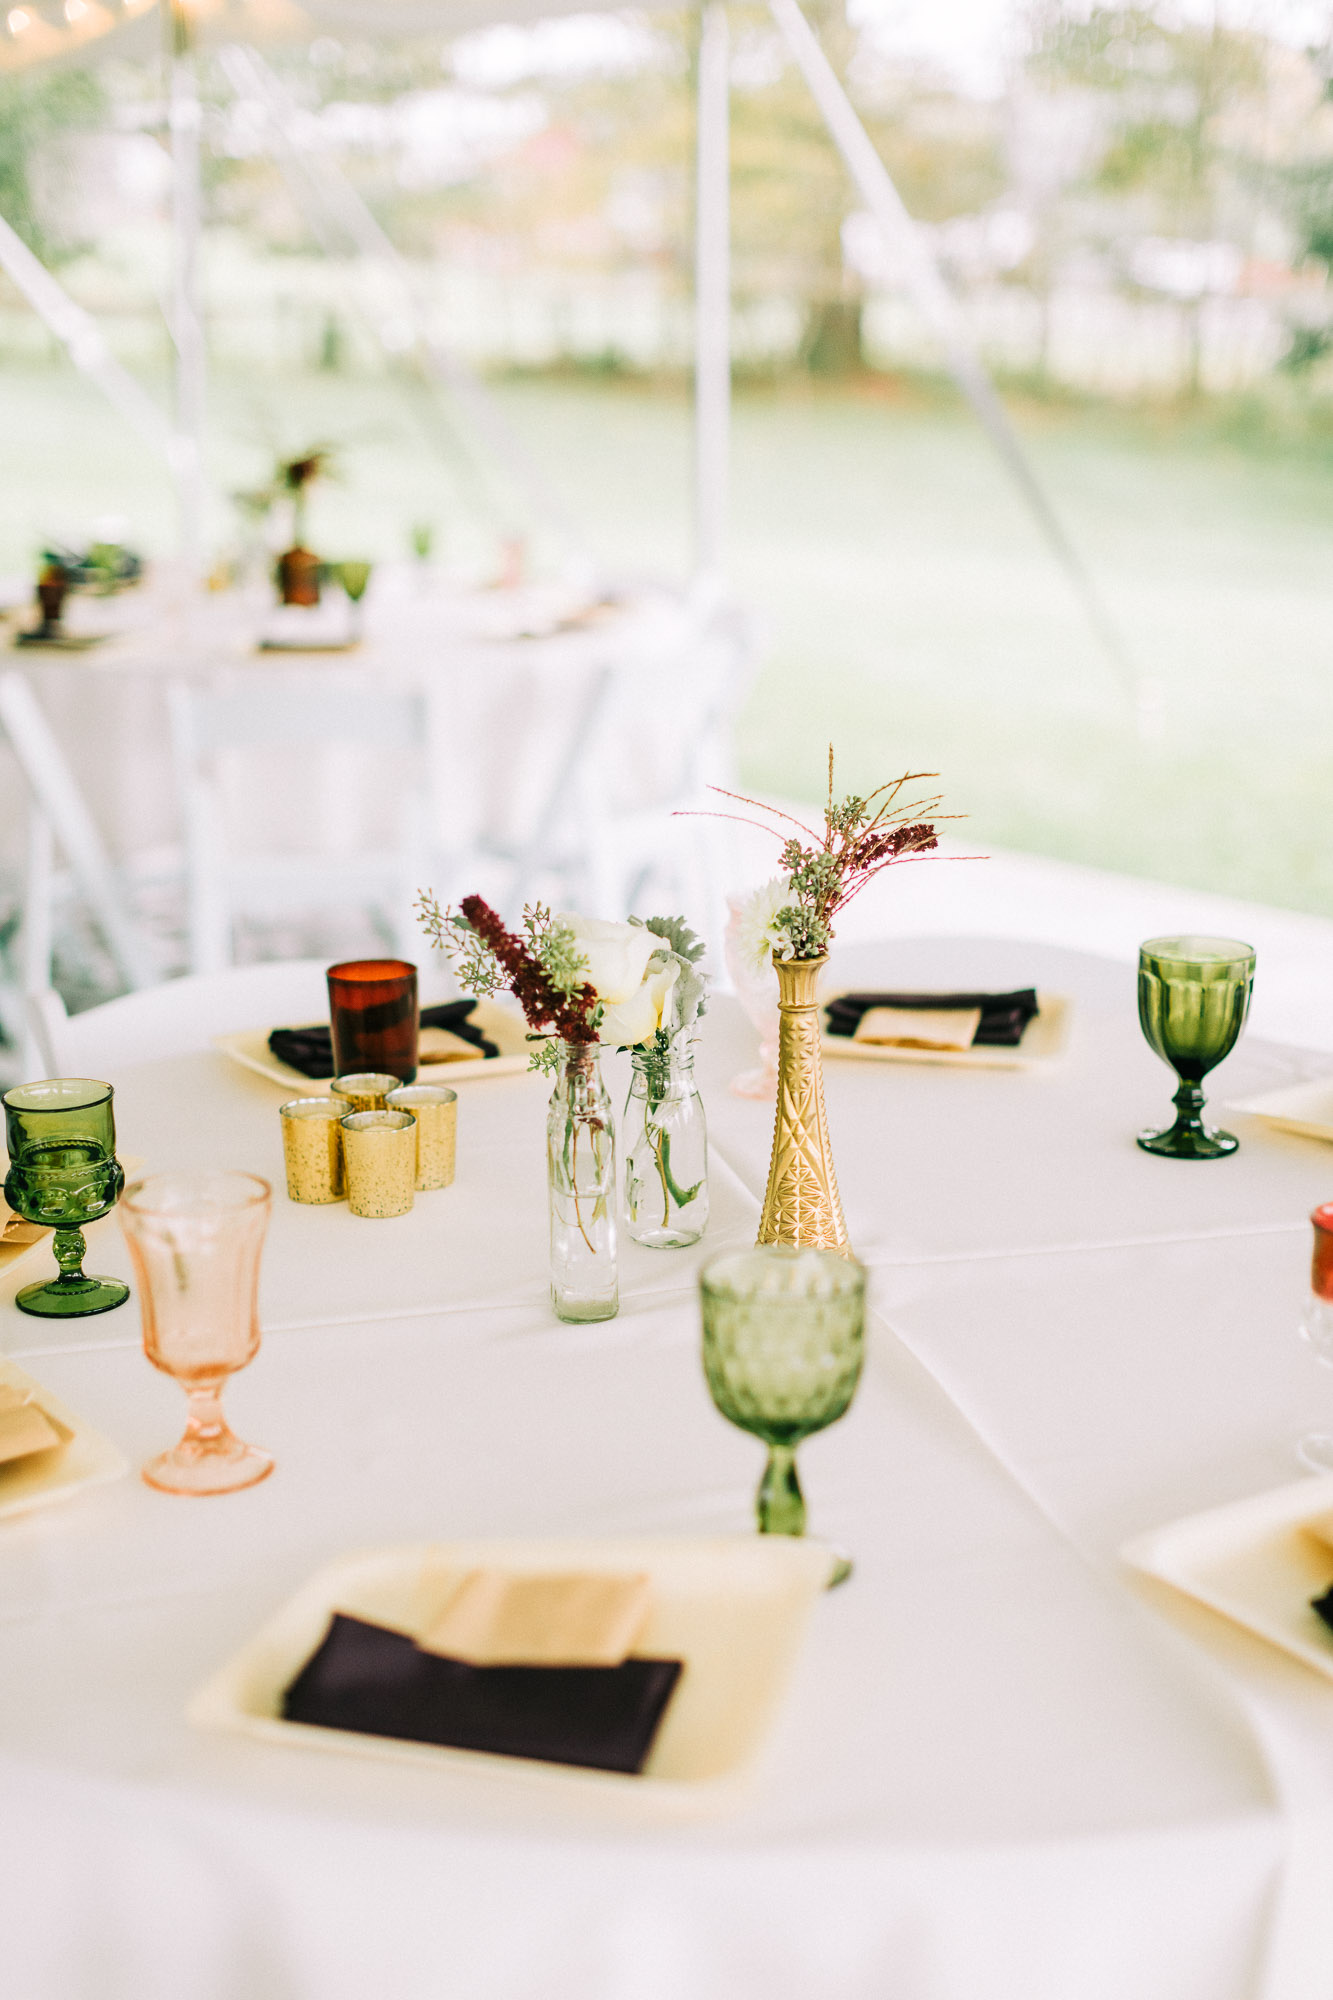 Lodge-at-Raven-Creek-October-wedding-7.jpg